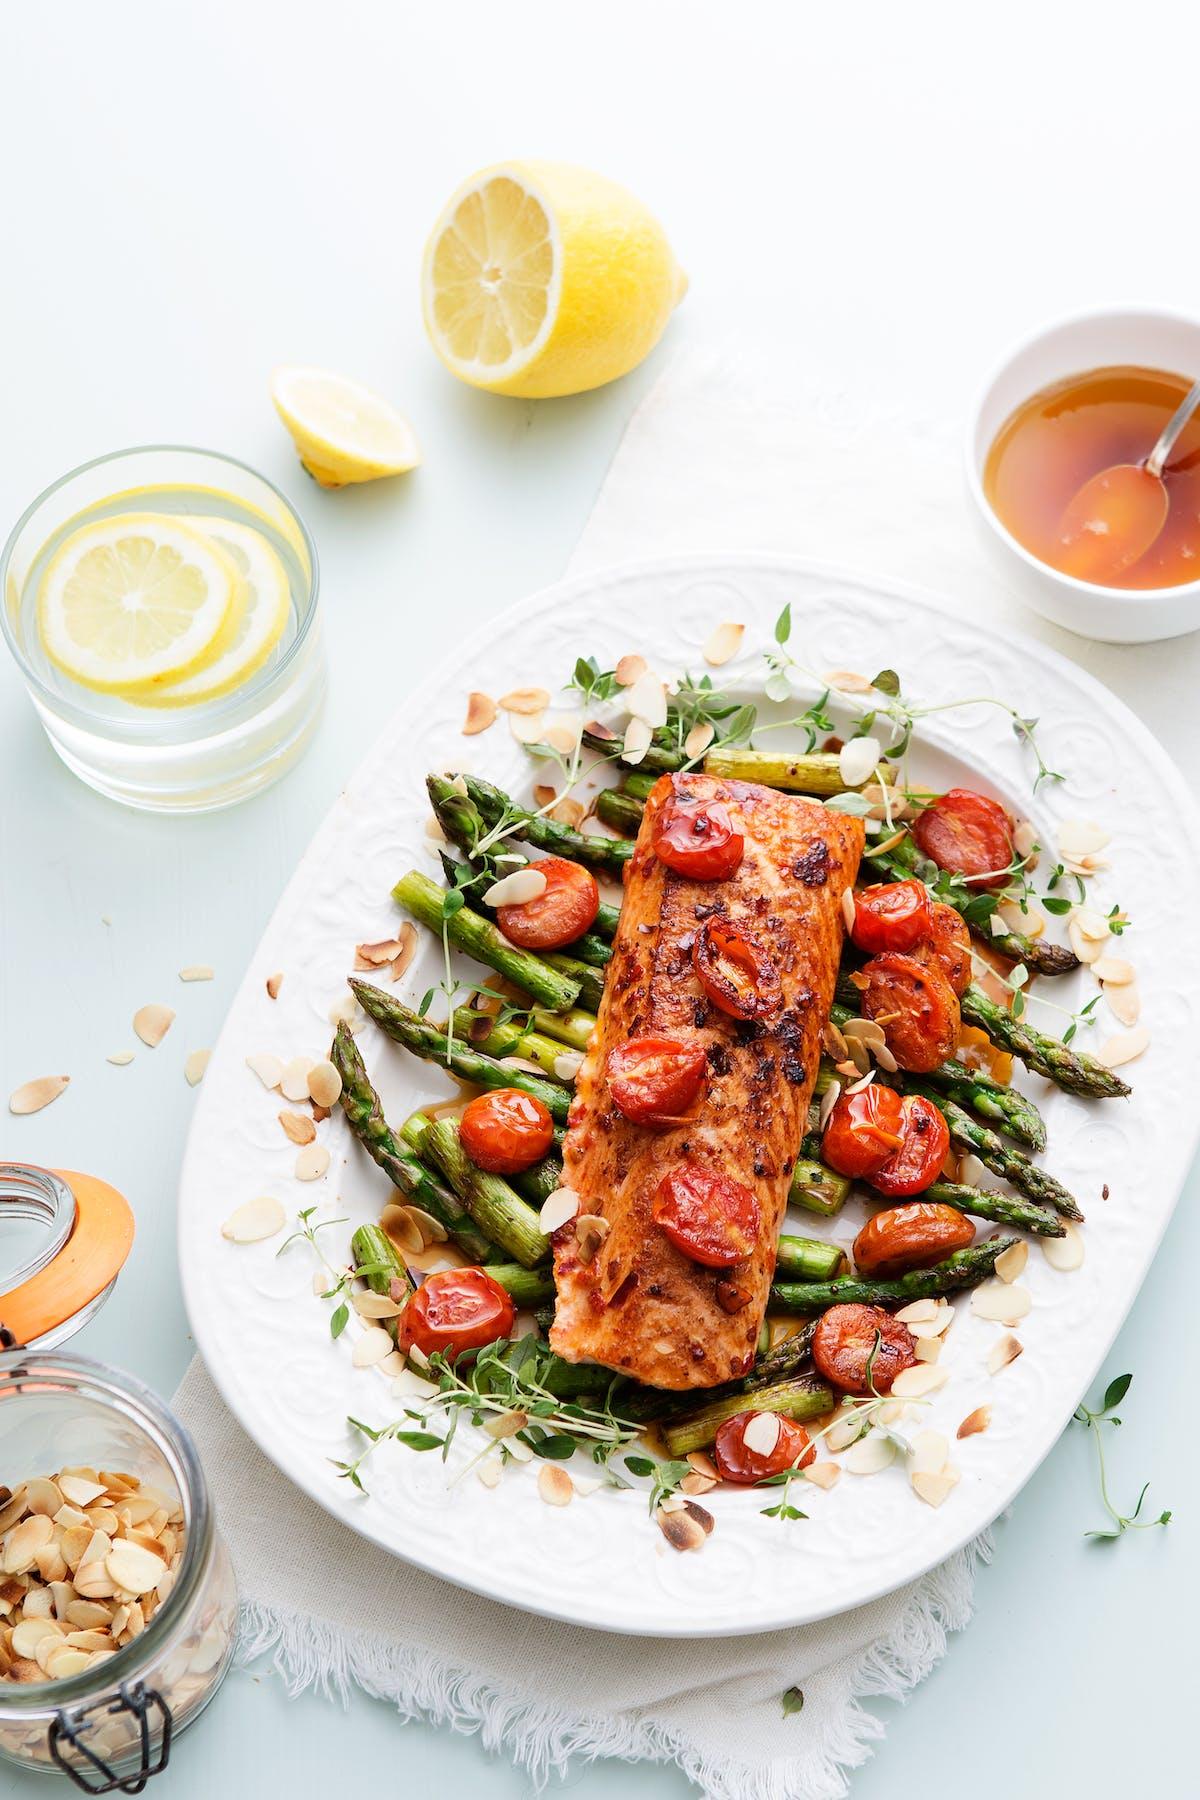 Keto chili salmon with tomato and asparagus